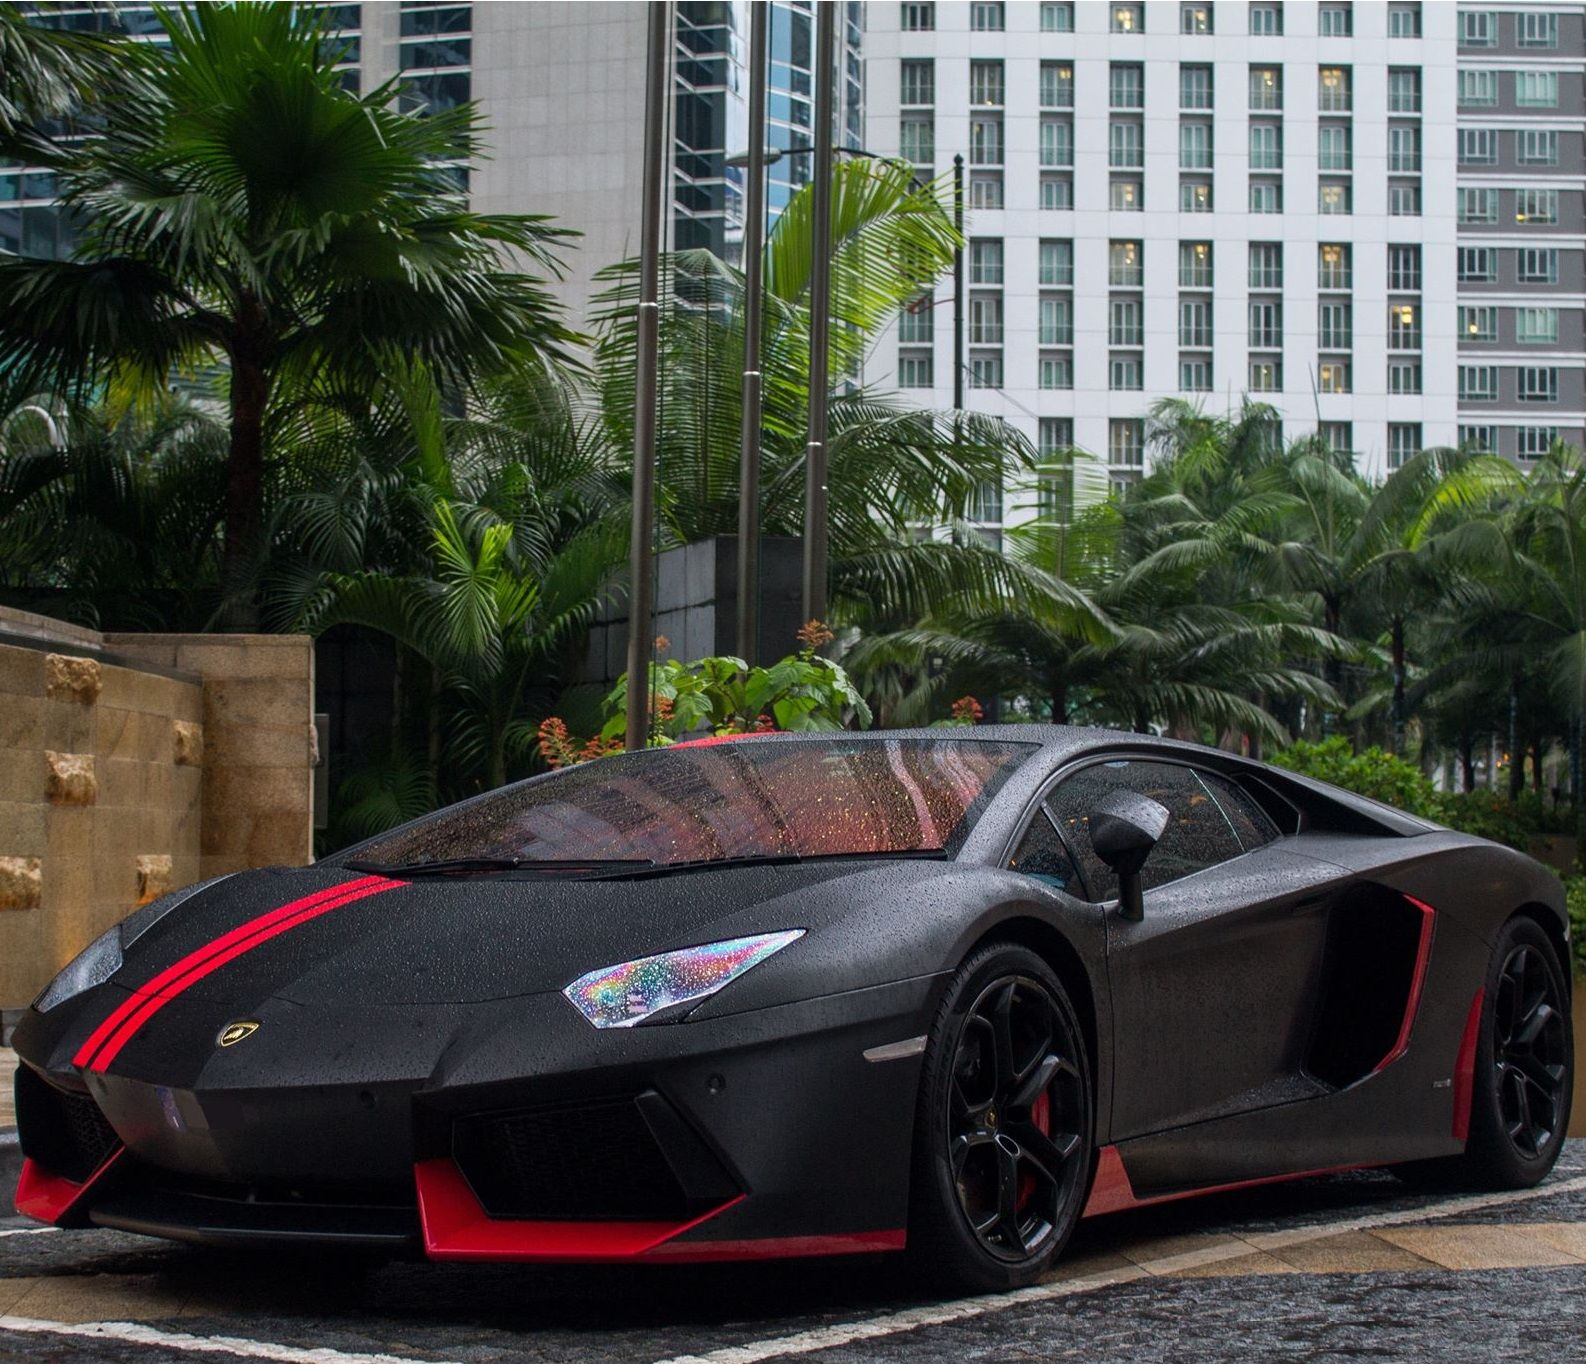 Red Lamborghini Aventador: Black And Red Aventador #CarFlash